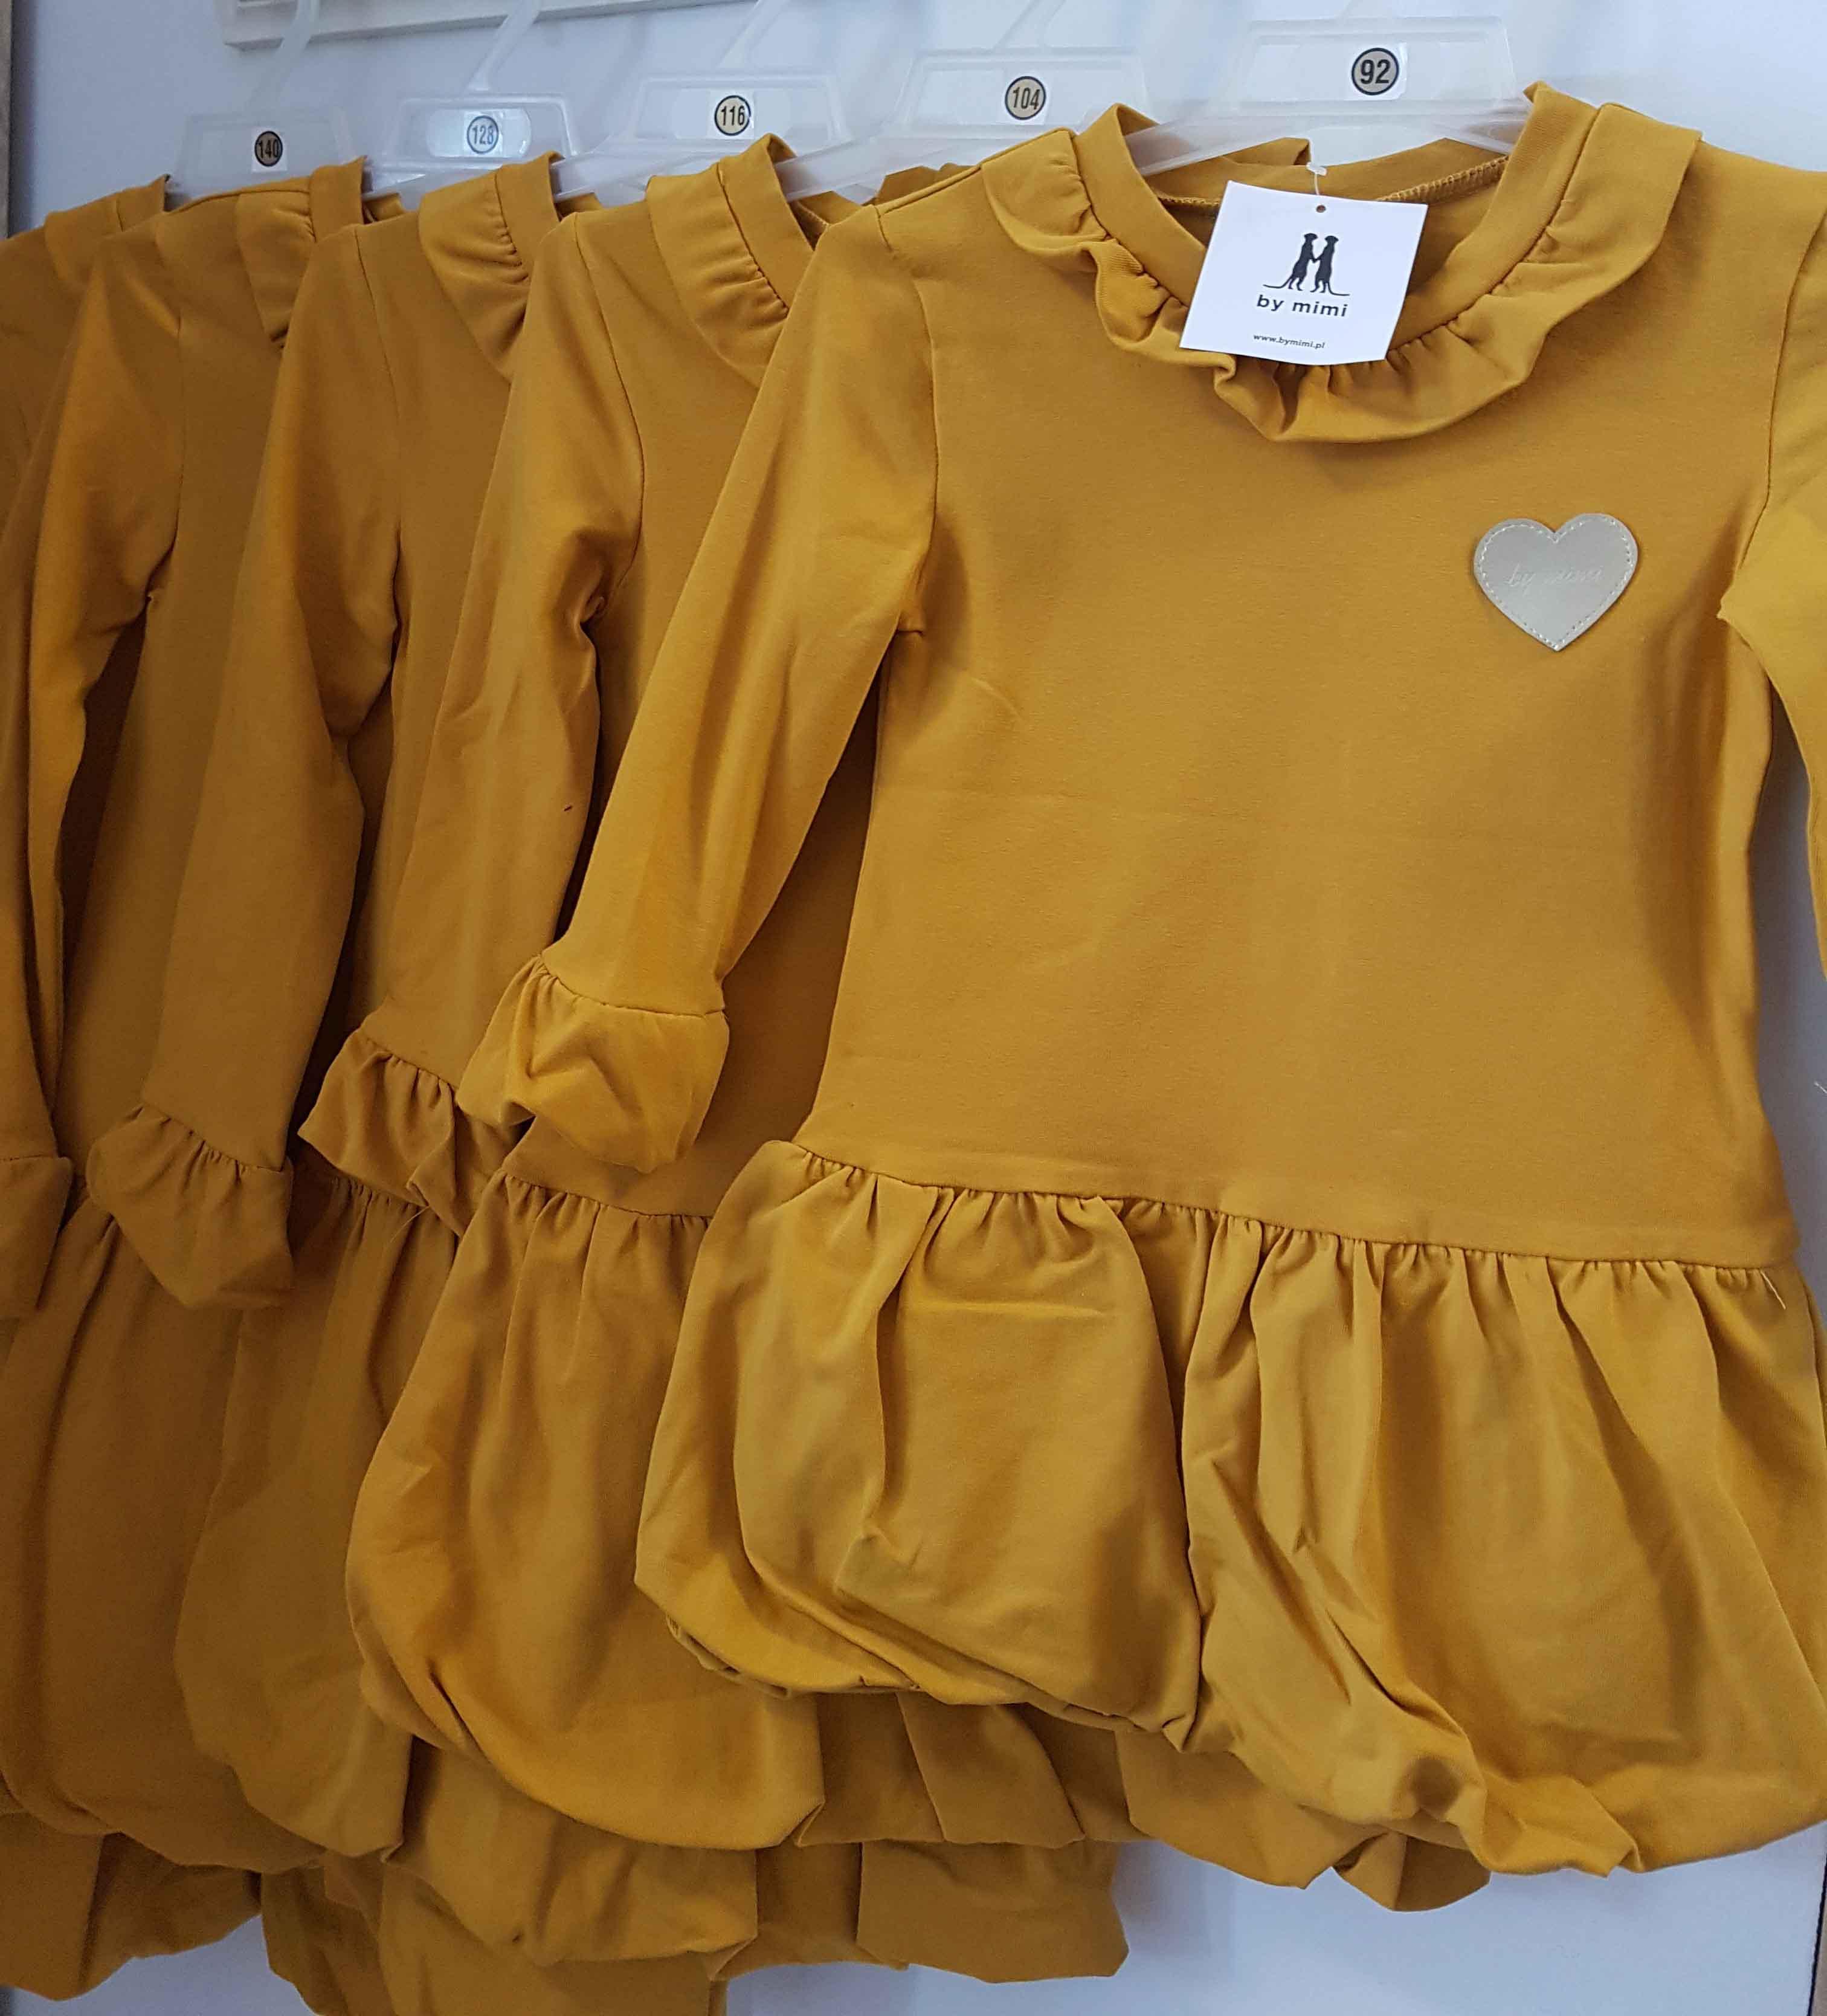 bcc07d4b12f2 By Mimi dievčenské horčicové šaty